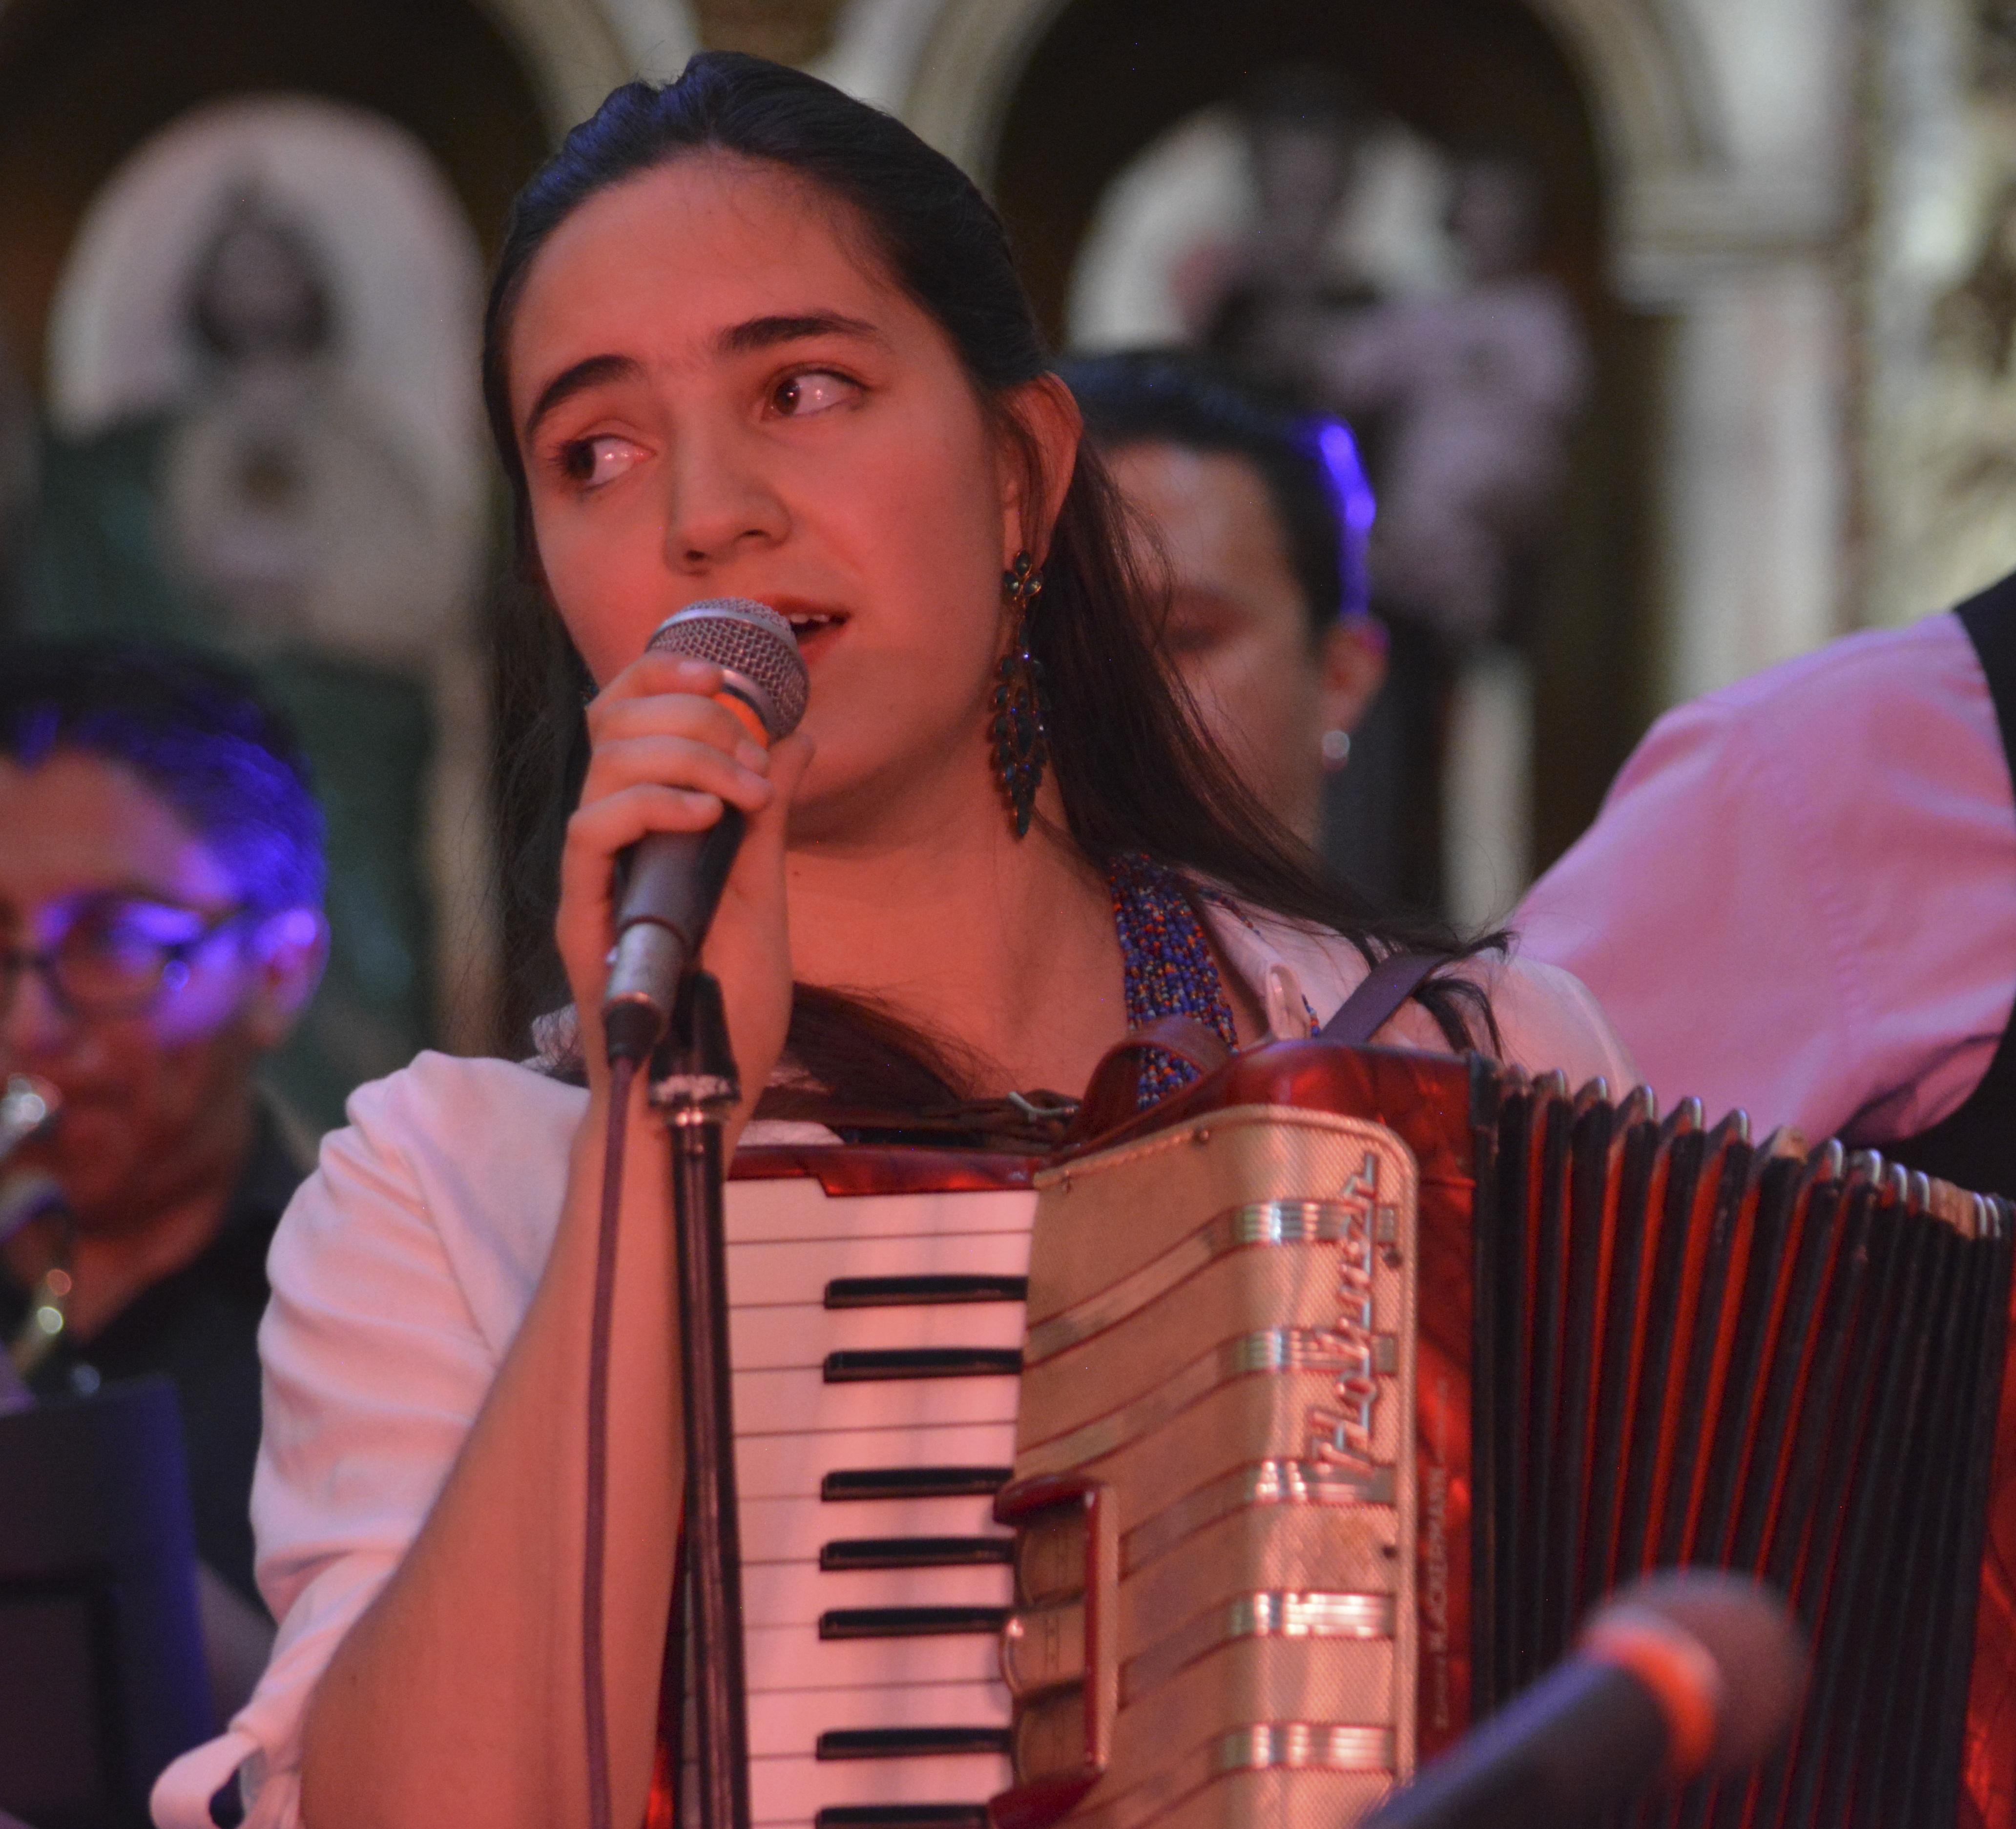 Rafaela Valarezo